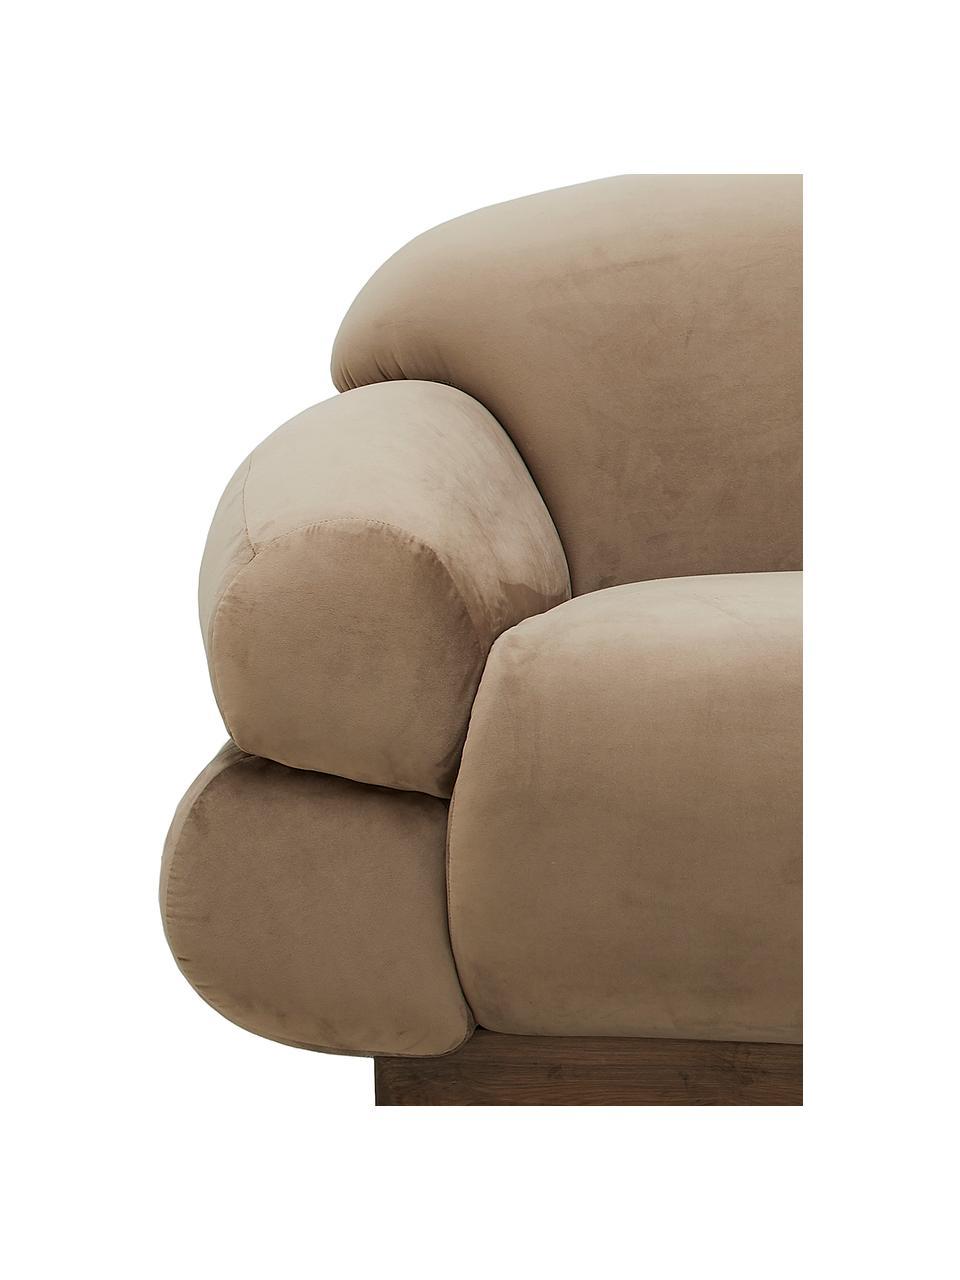 Samt-Sofa Sofie (3-Sitzer) in Braun, Bezug: Polyestersamt, Sockel: Eschenholz, Braun, B 214 x T 95 cm